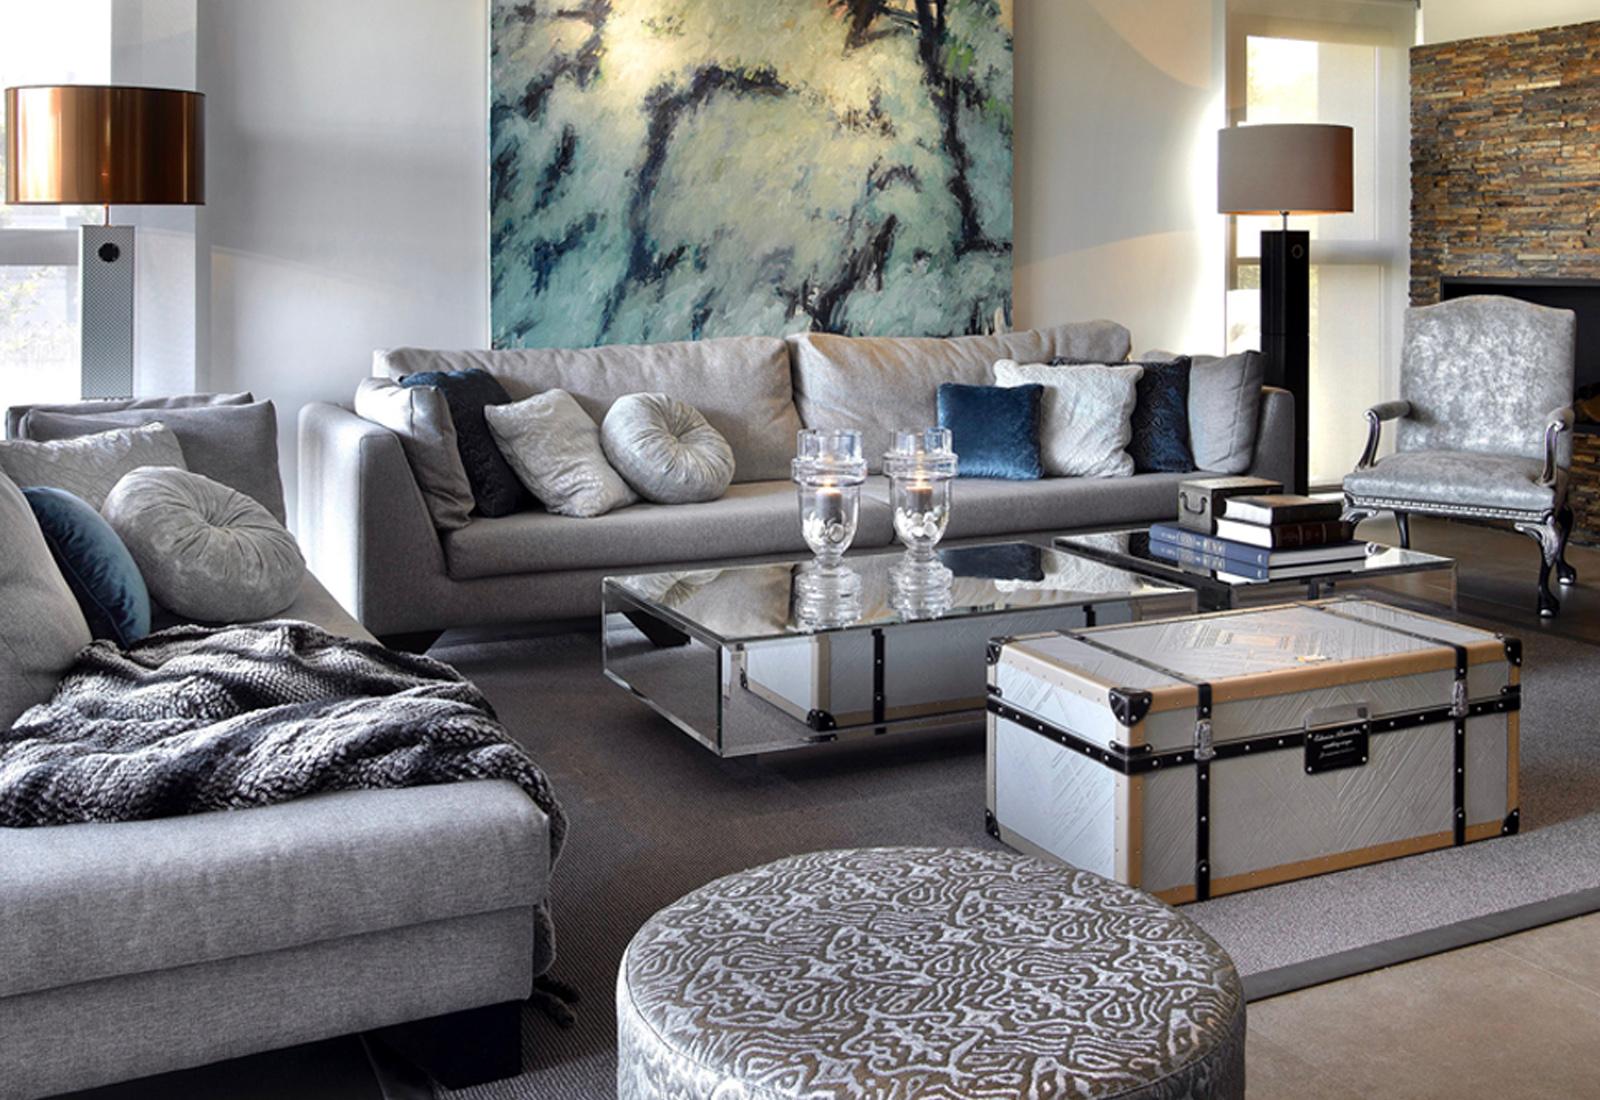 Sofa And Chaise Lounge Set